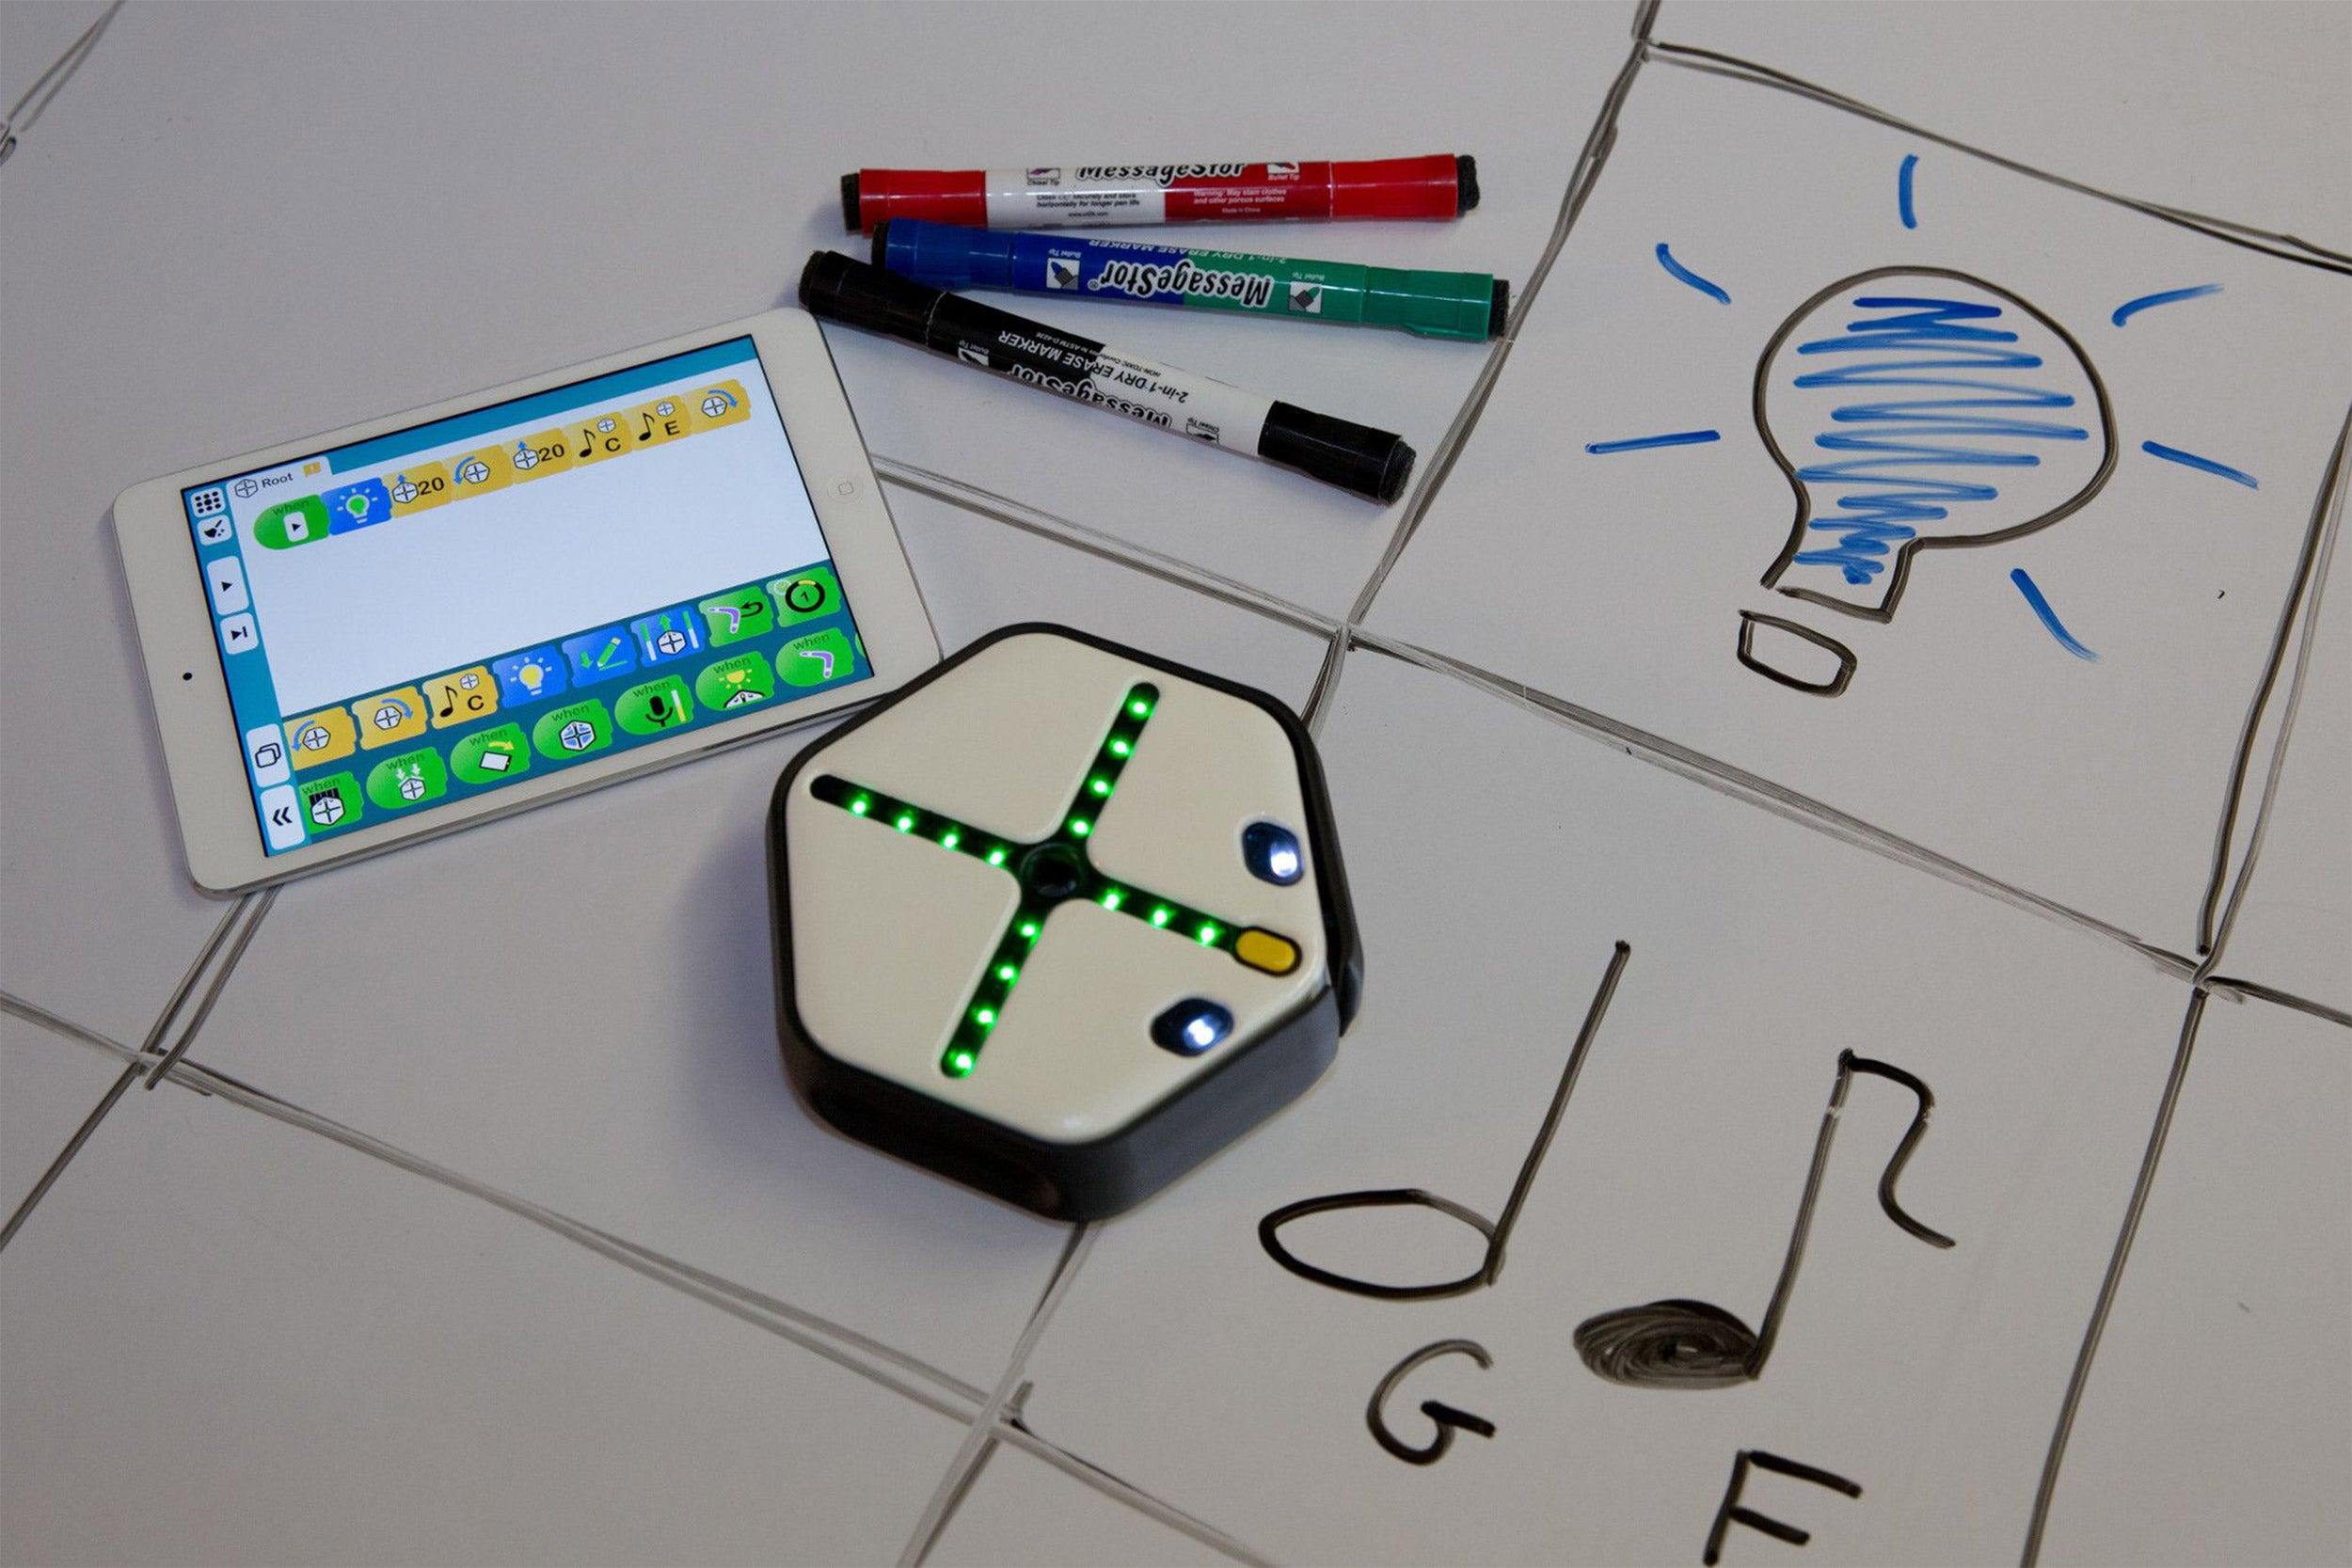 iRobot acquires Root Robotics, bringing coding education to classrooms worldwide